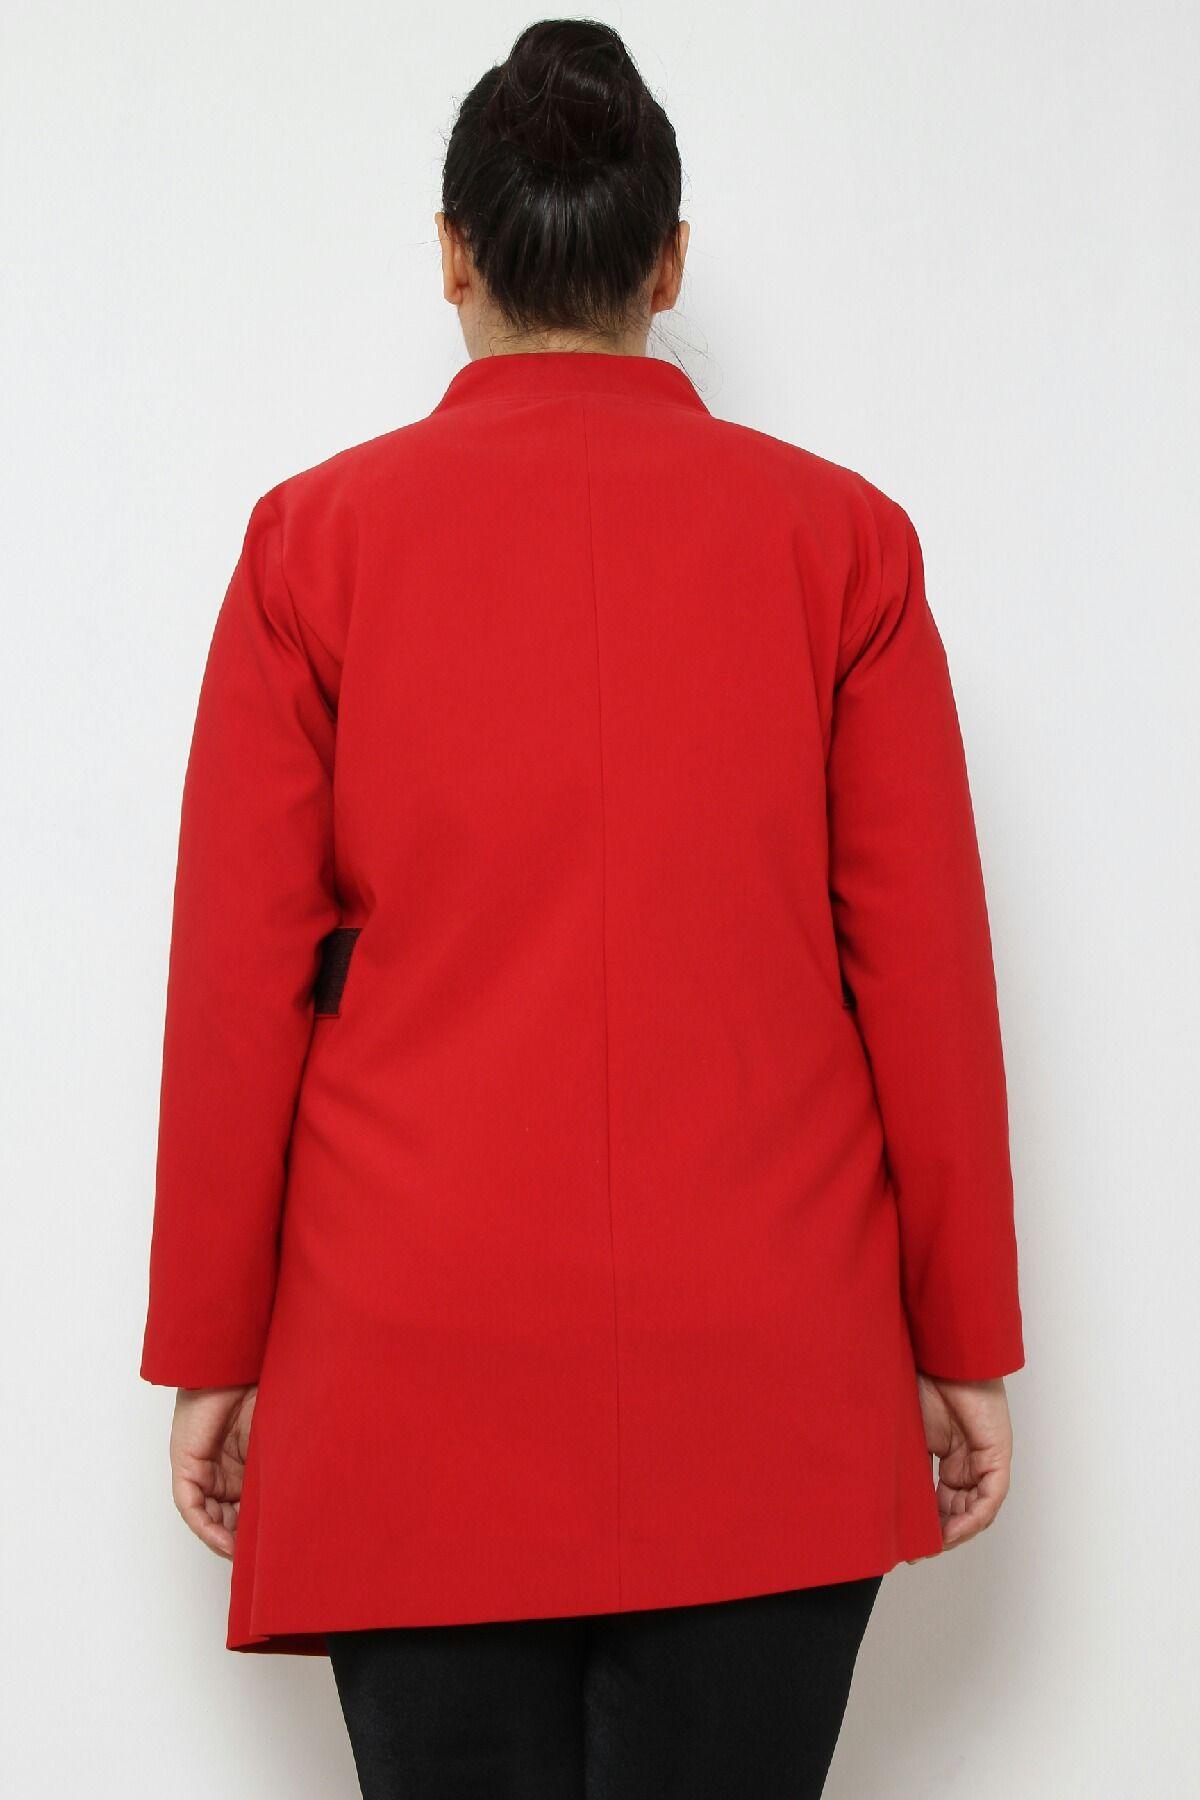 Sport-Red